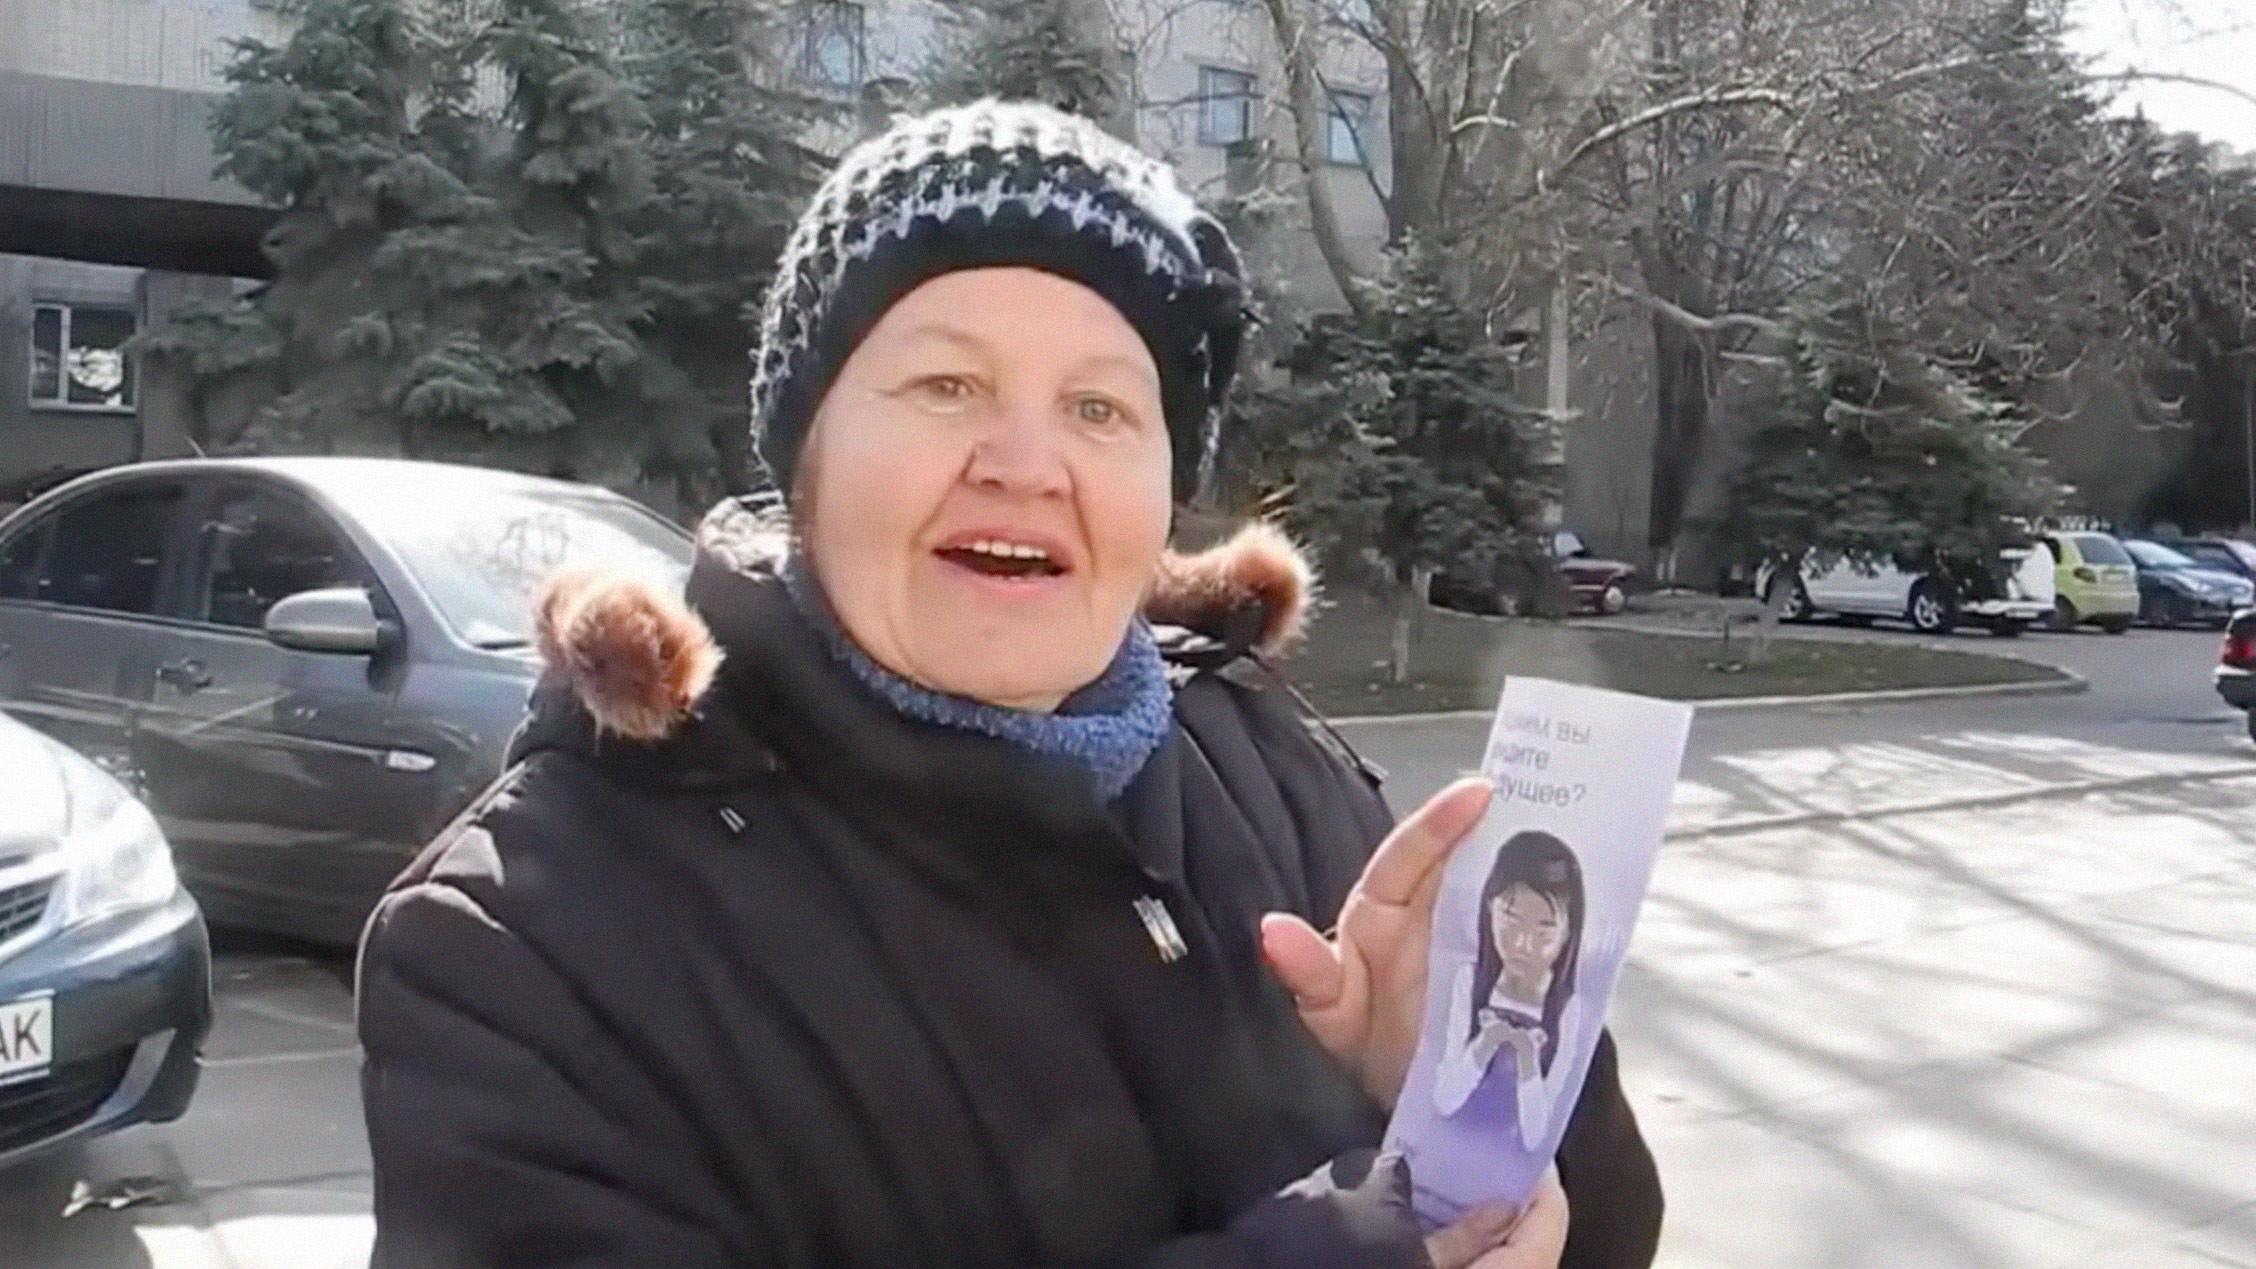 "<p>Кадр из <a href=""https://www.youtube.com/watch?v=UUOvwOzTMw4"">видео Serega Kuznetsov</a>/ Скриншот &copy; L!FE</p>"